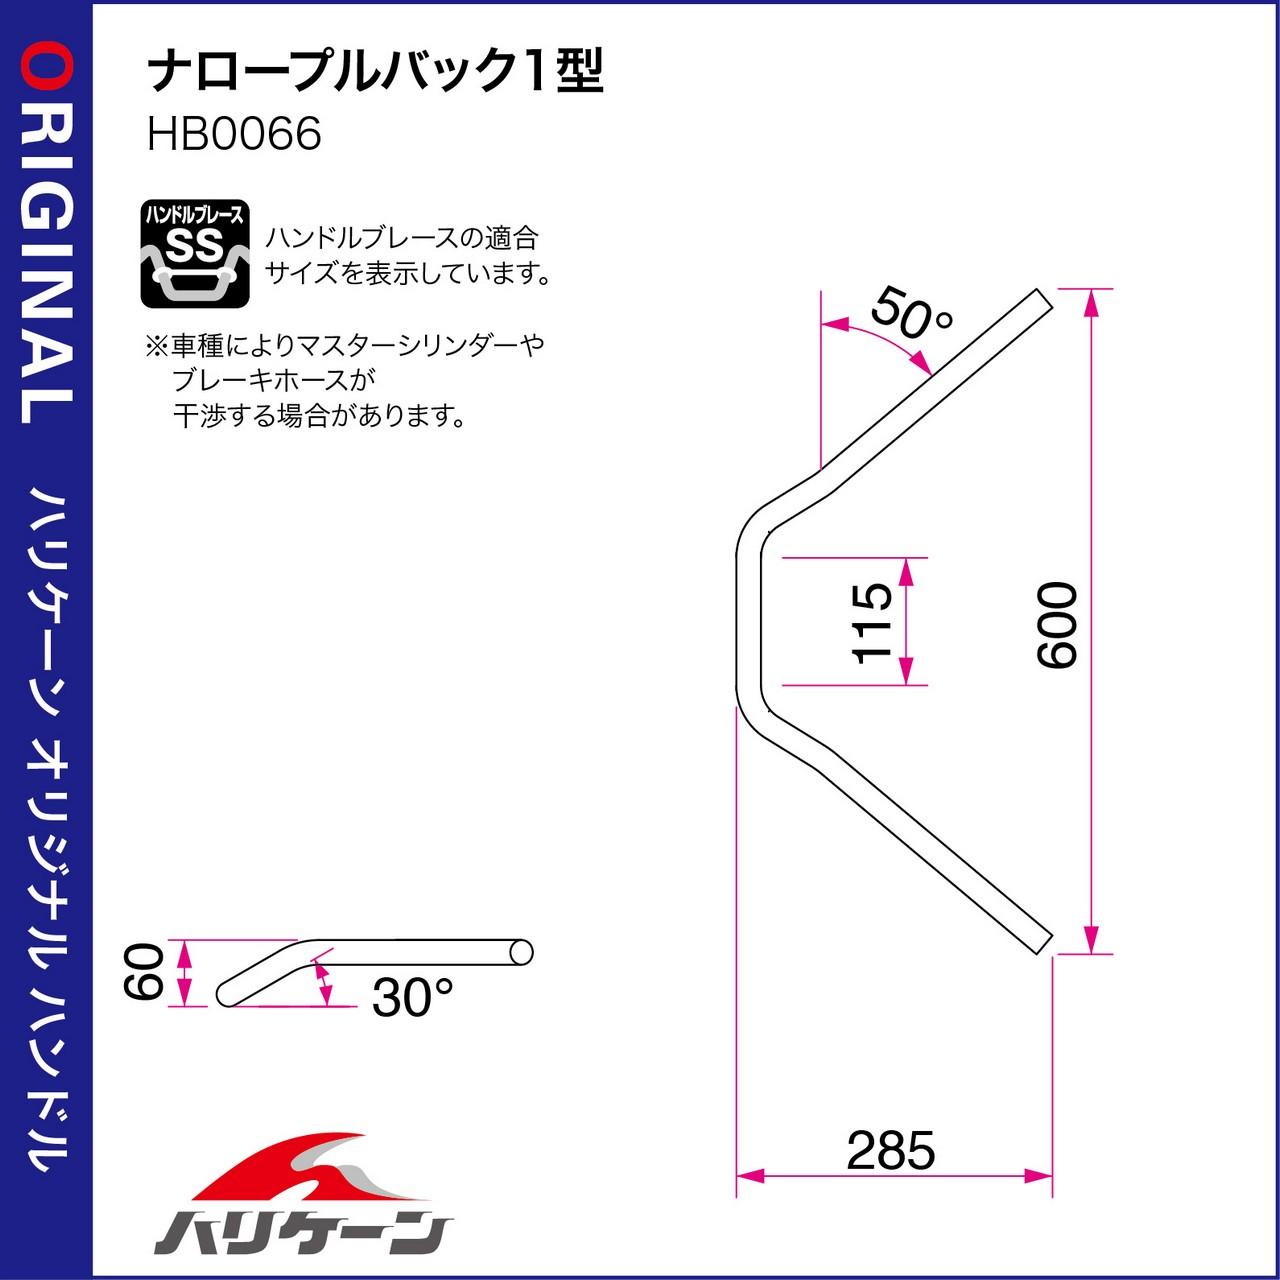 【HURRICANE】Narrow pull Back 1 Type Φ 7 / 8 吋 鋼製把手 - 「Webike-摩托百貨」